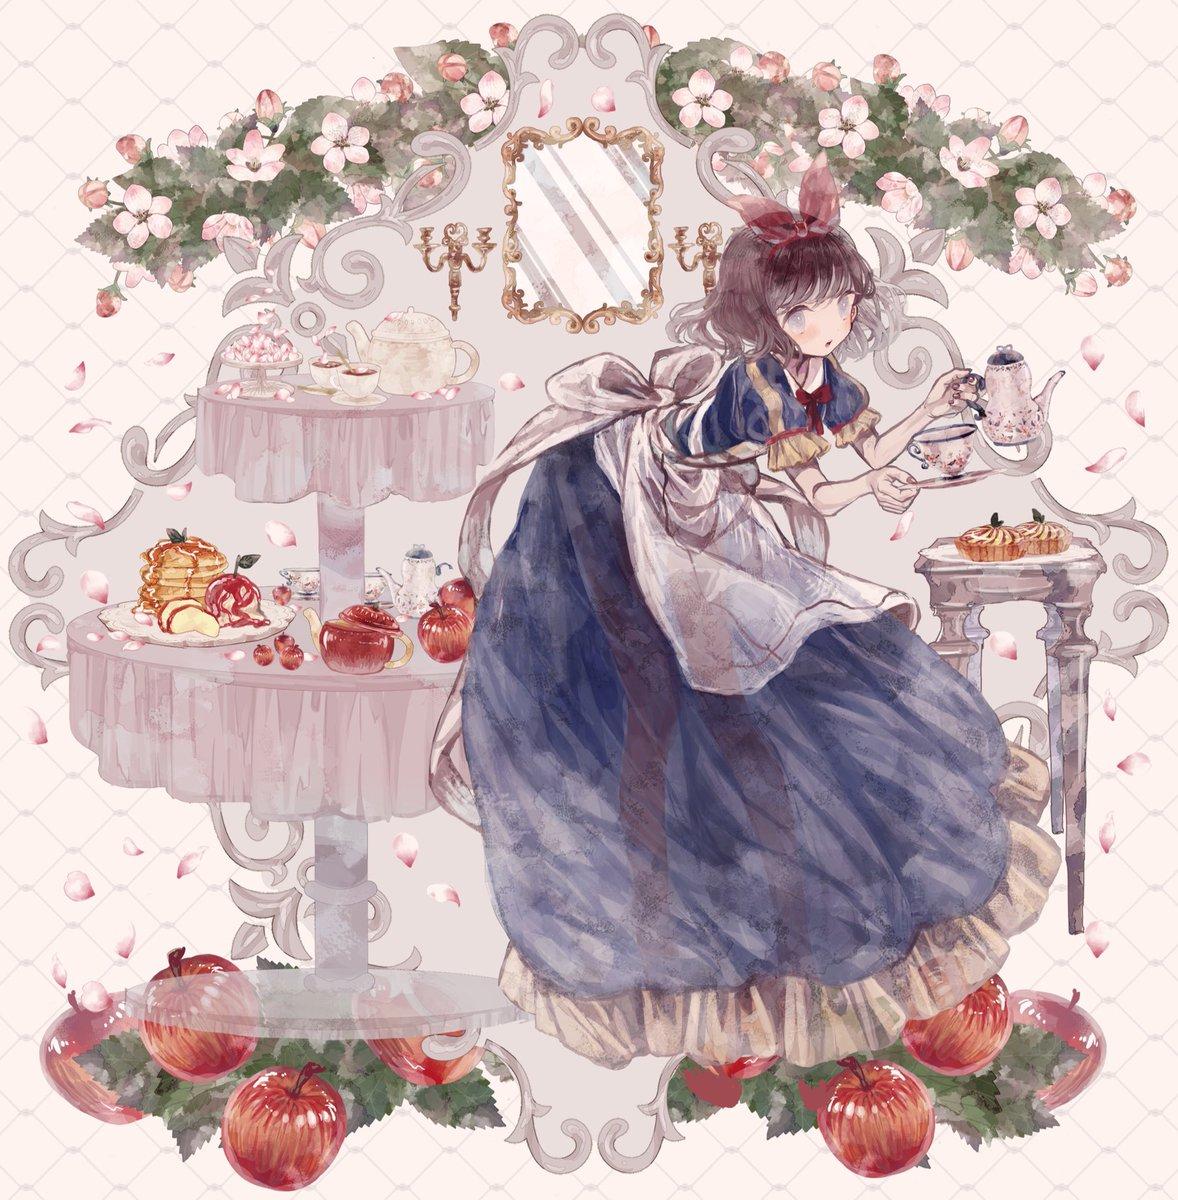 Twoucan グリム童話とメイド服 の注目ツイートイラストマンガ